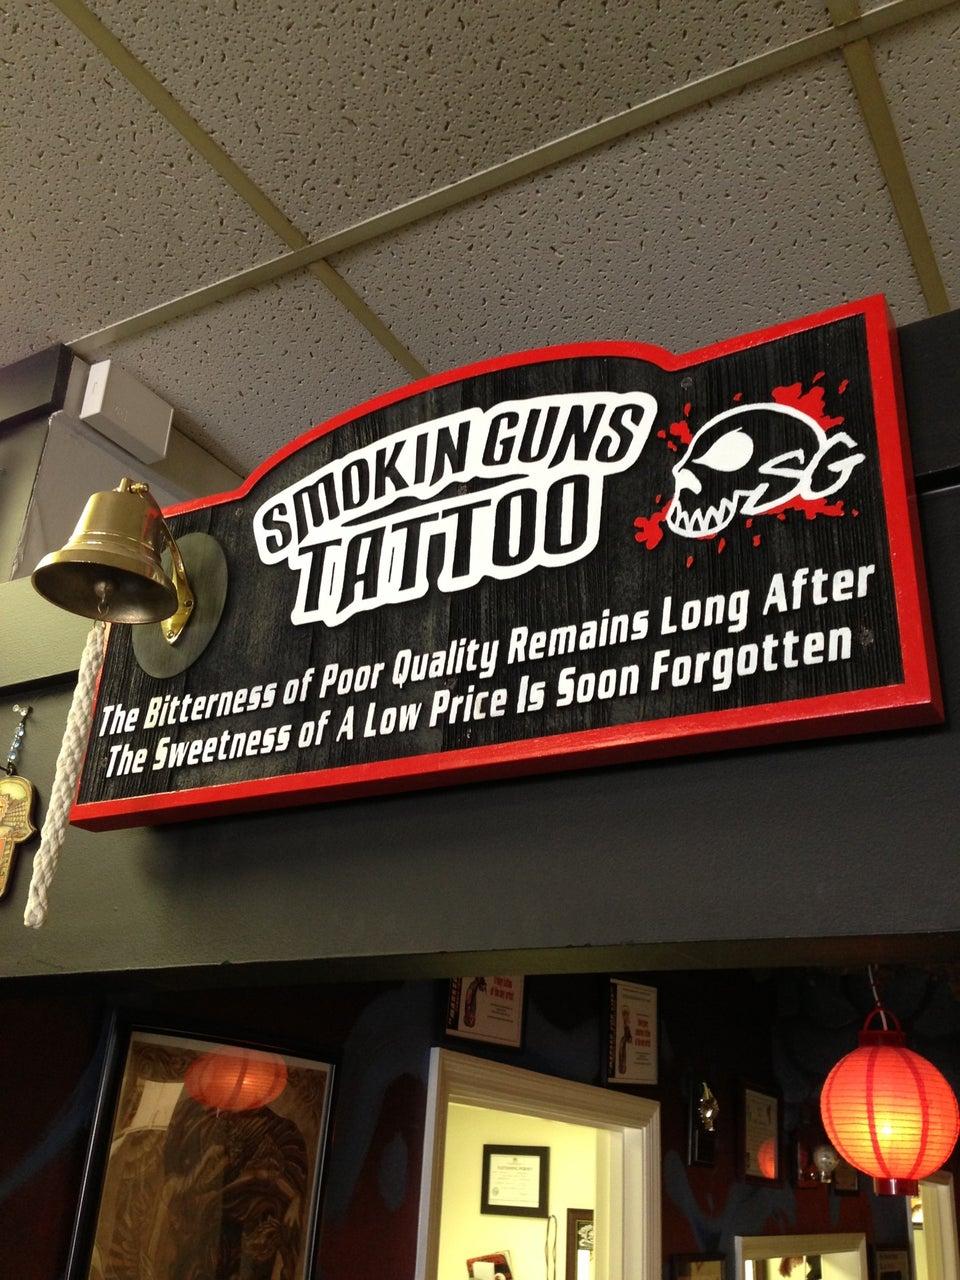 Smokin' Guns Tattoo